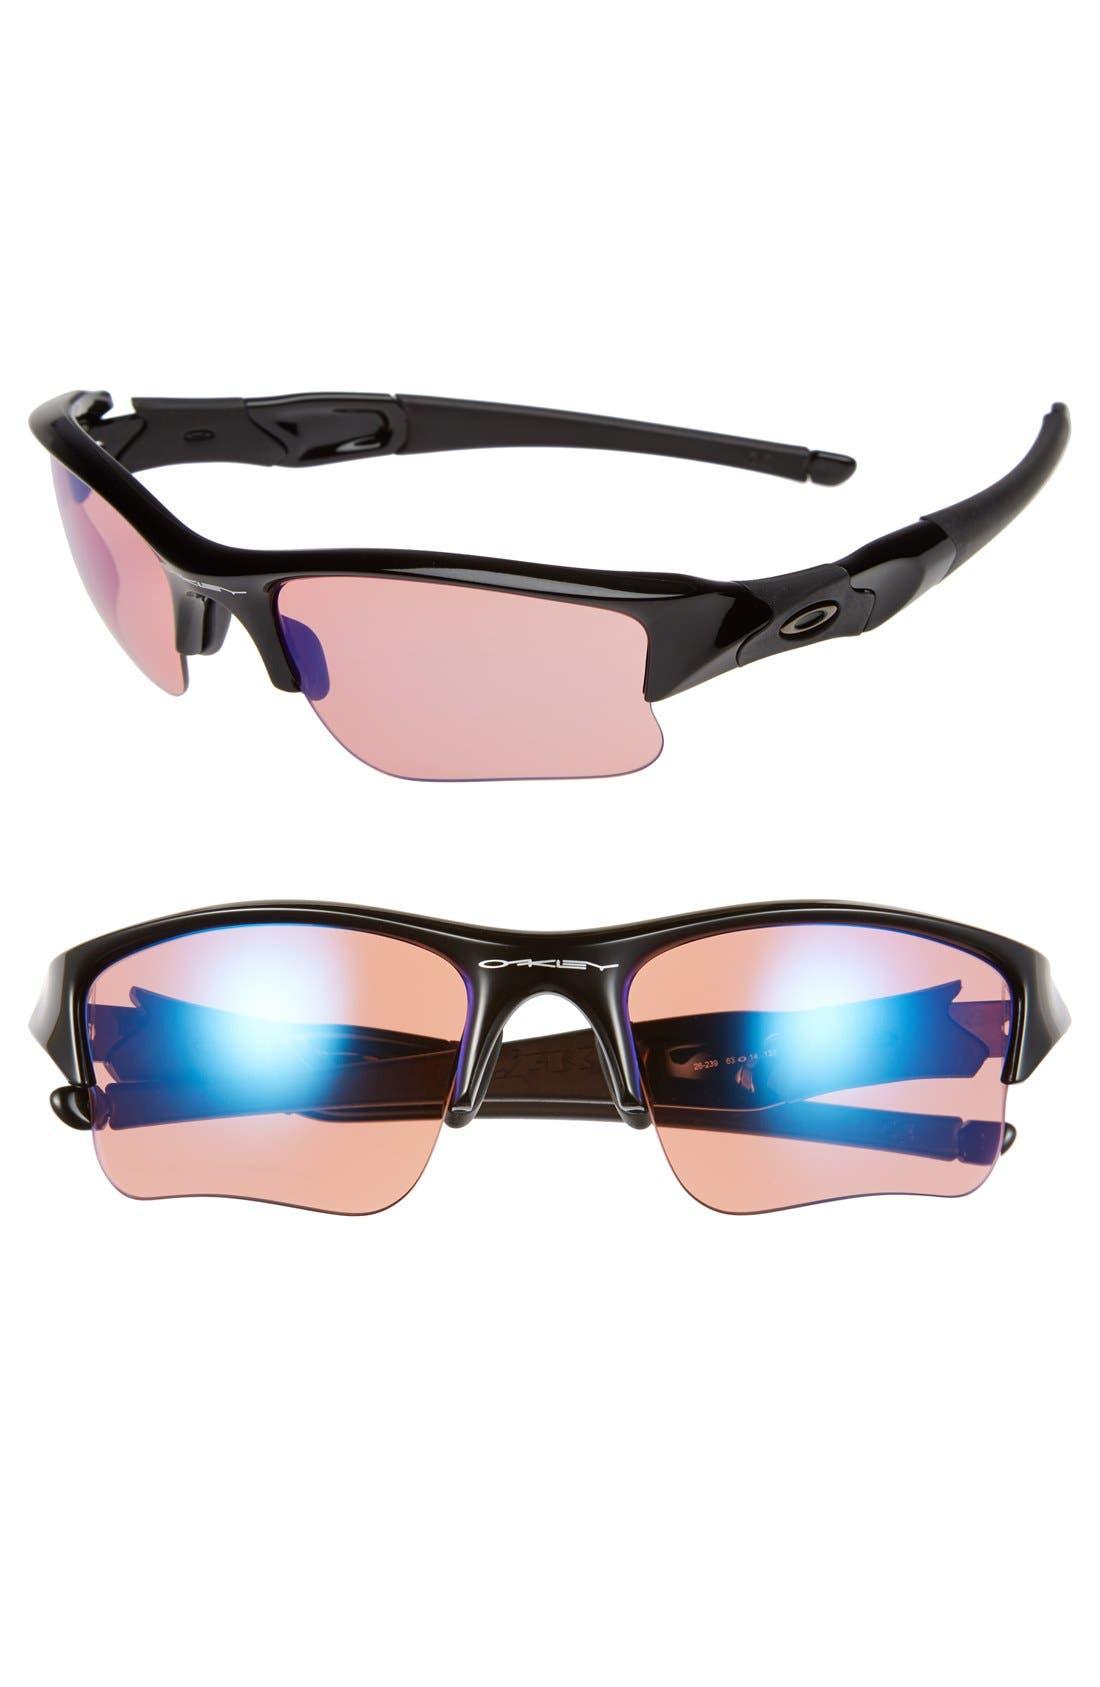 Alternate Image 1 Selected - Oakley 'Flak Jacket XLJ' 63mm Sunglasses